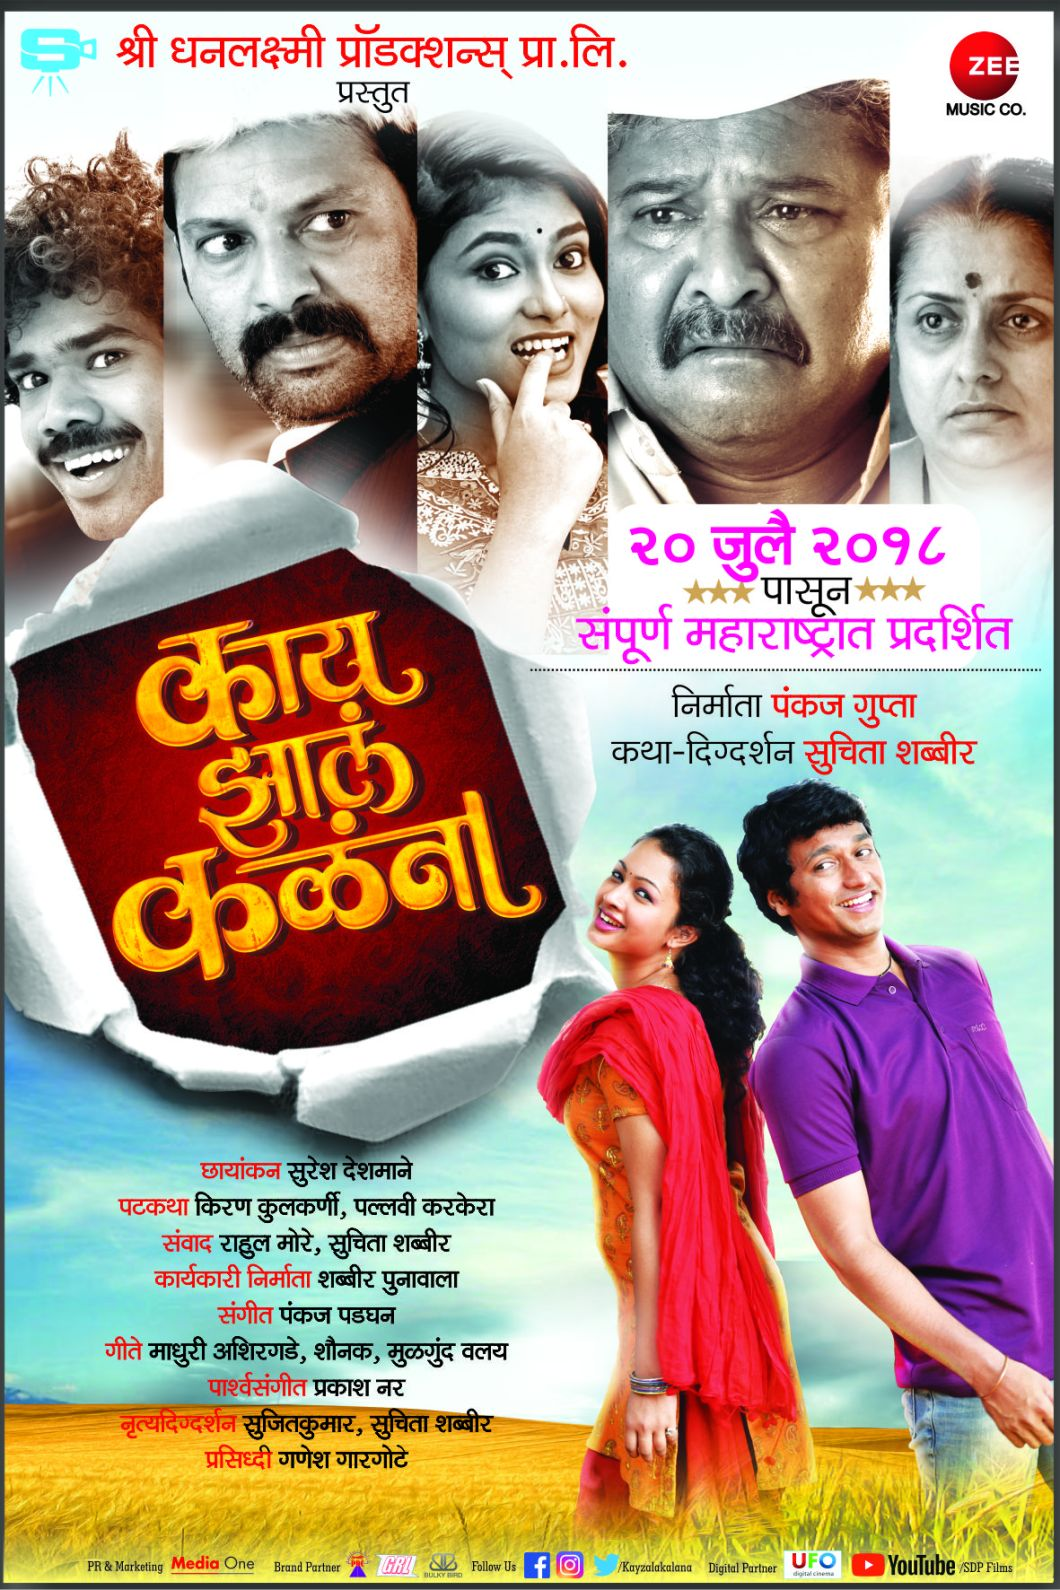 marathi ad.jpg